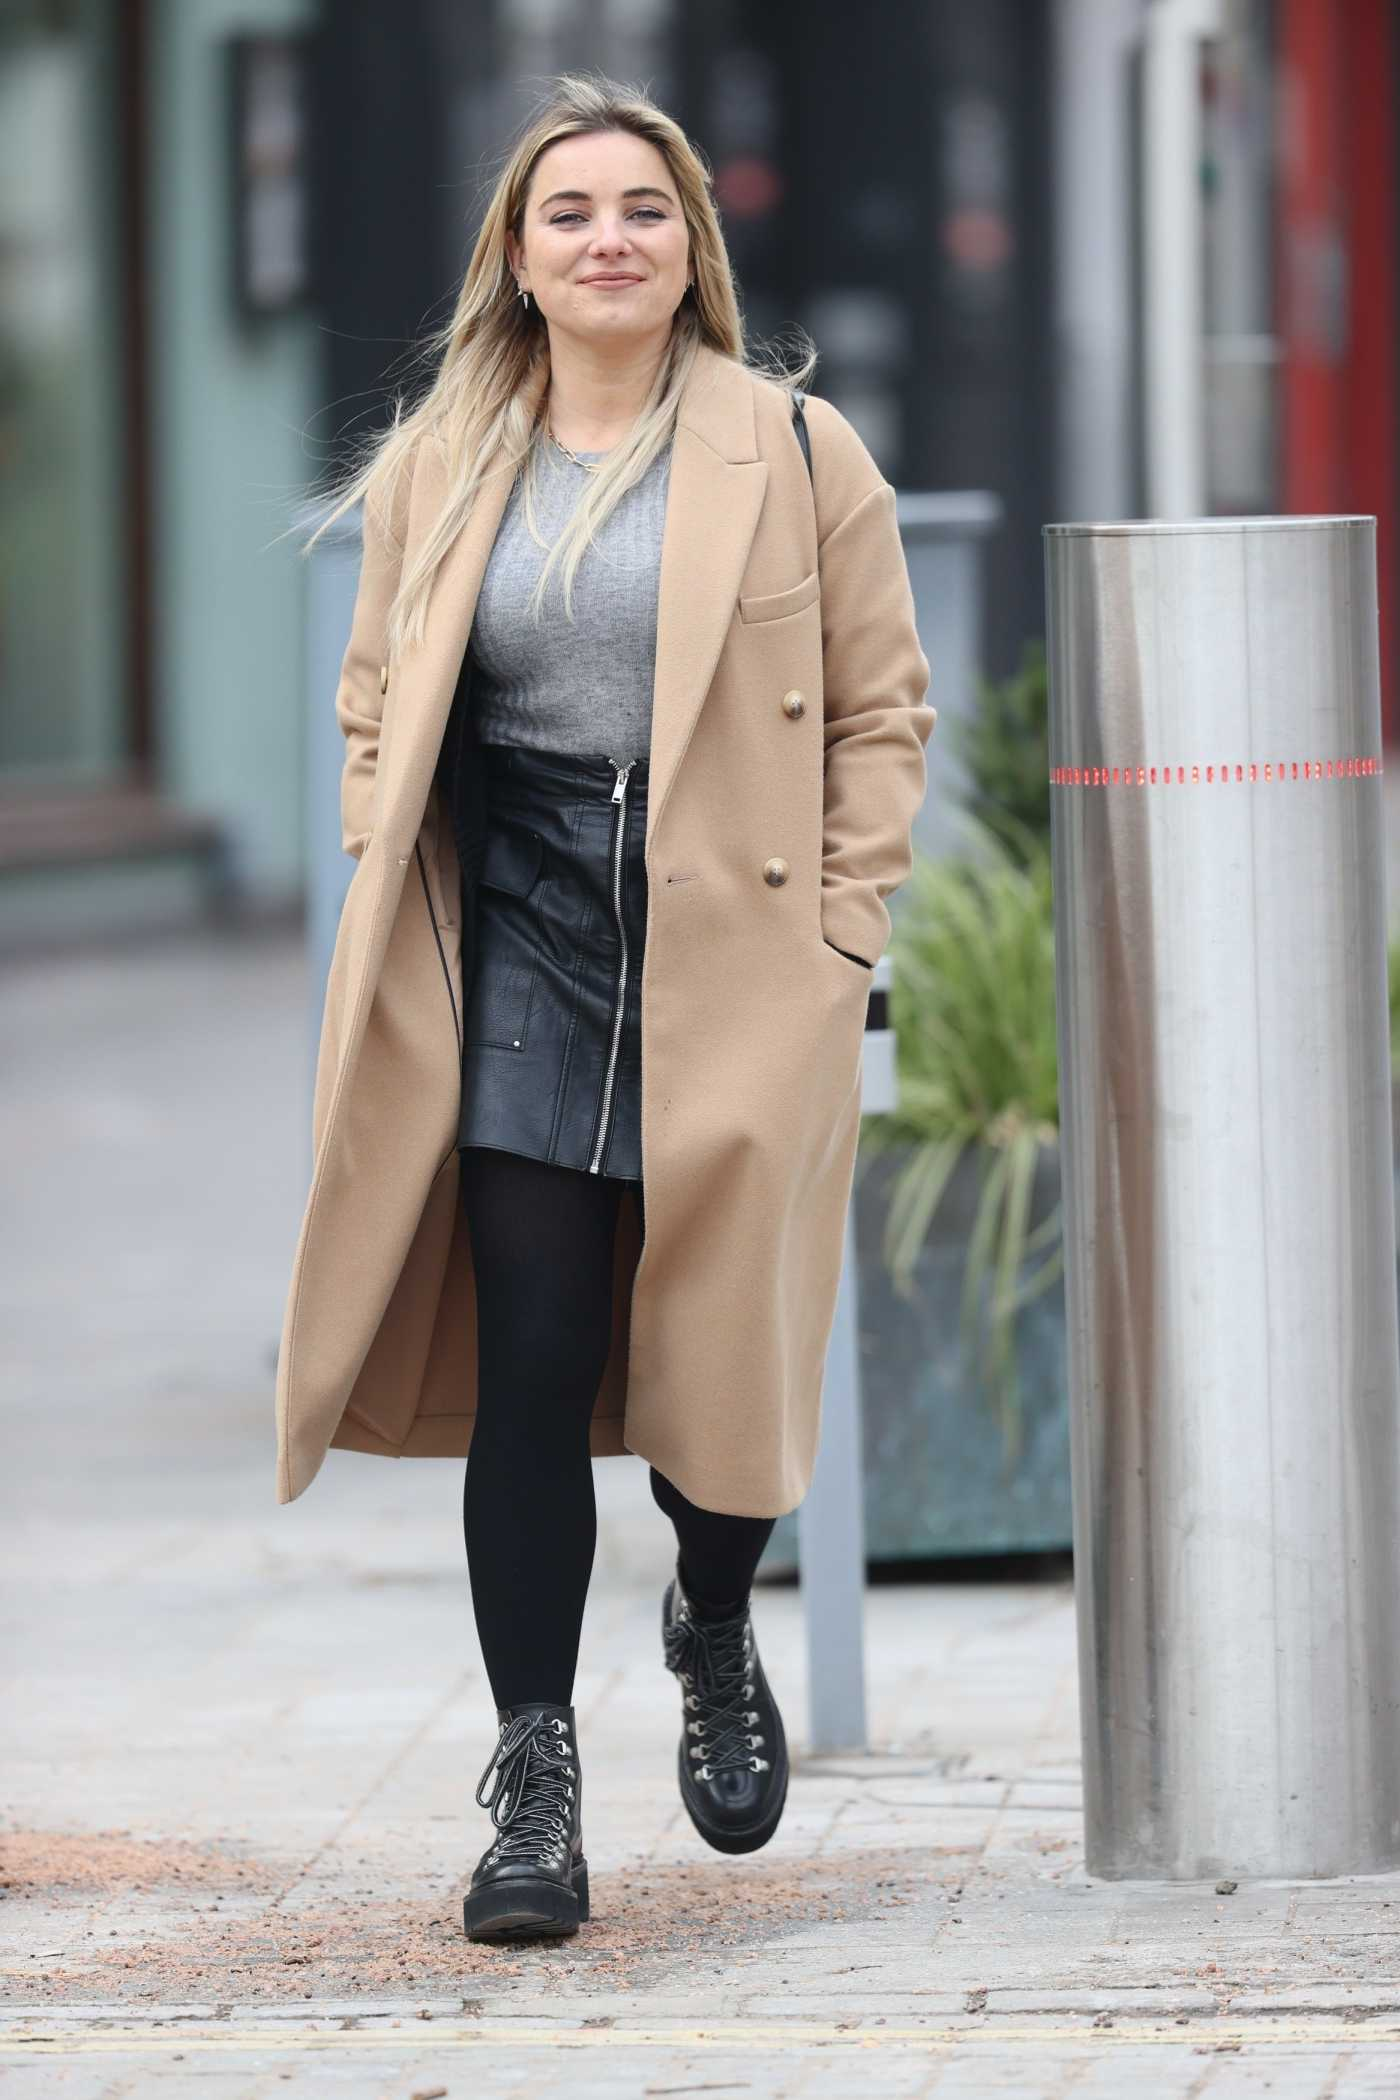 Sian Welby in a Beige Coat Leaves the Global Studios in London 02/11/2021